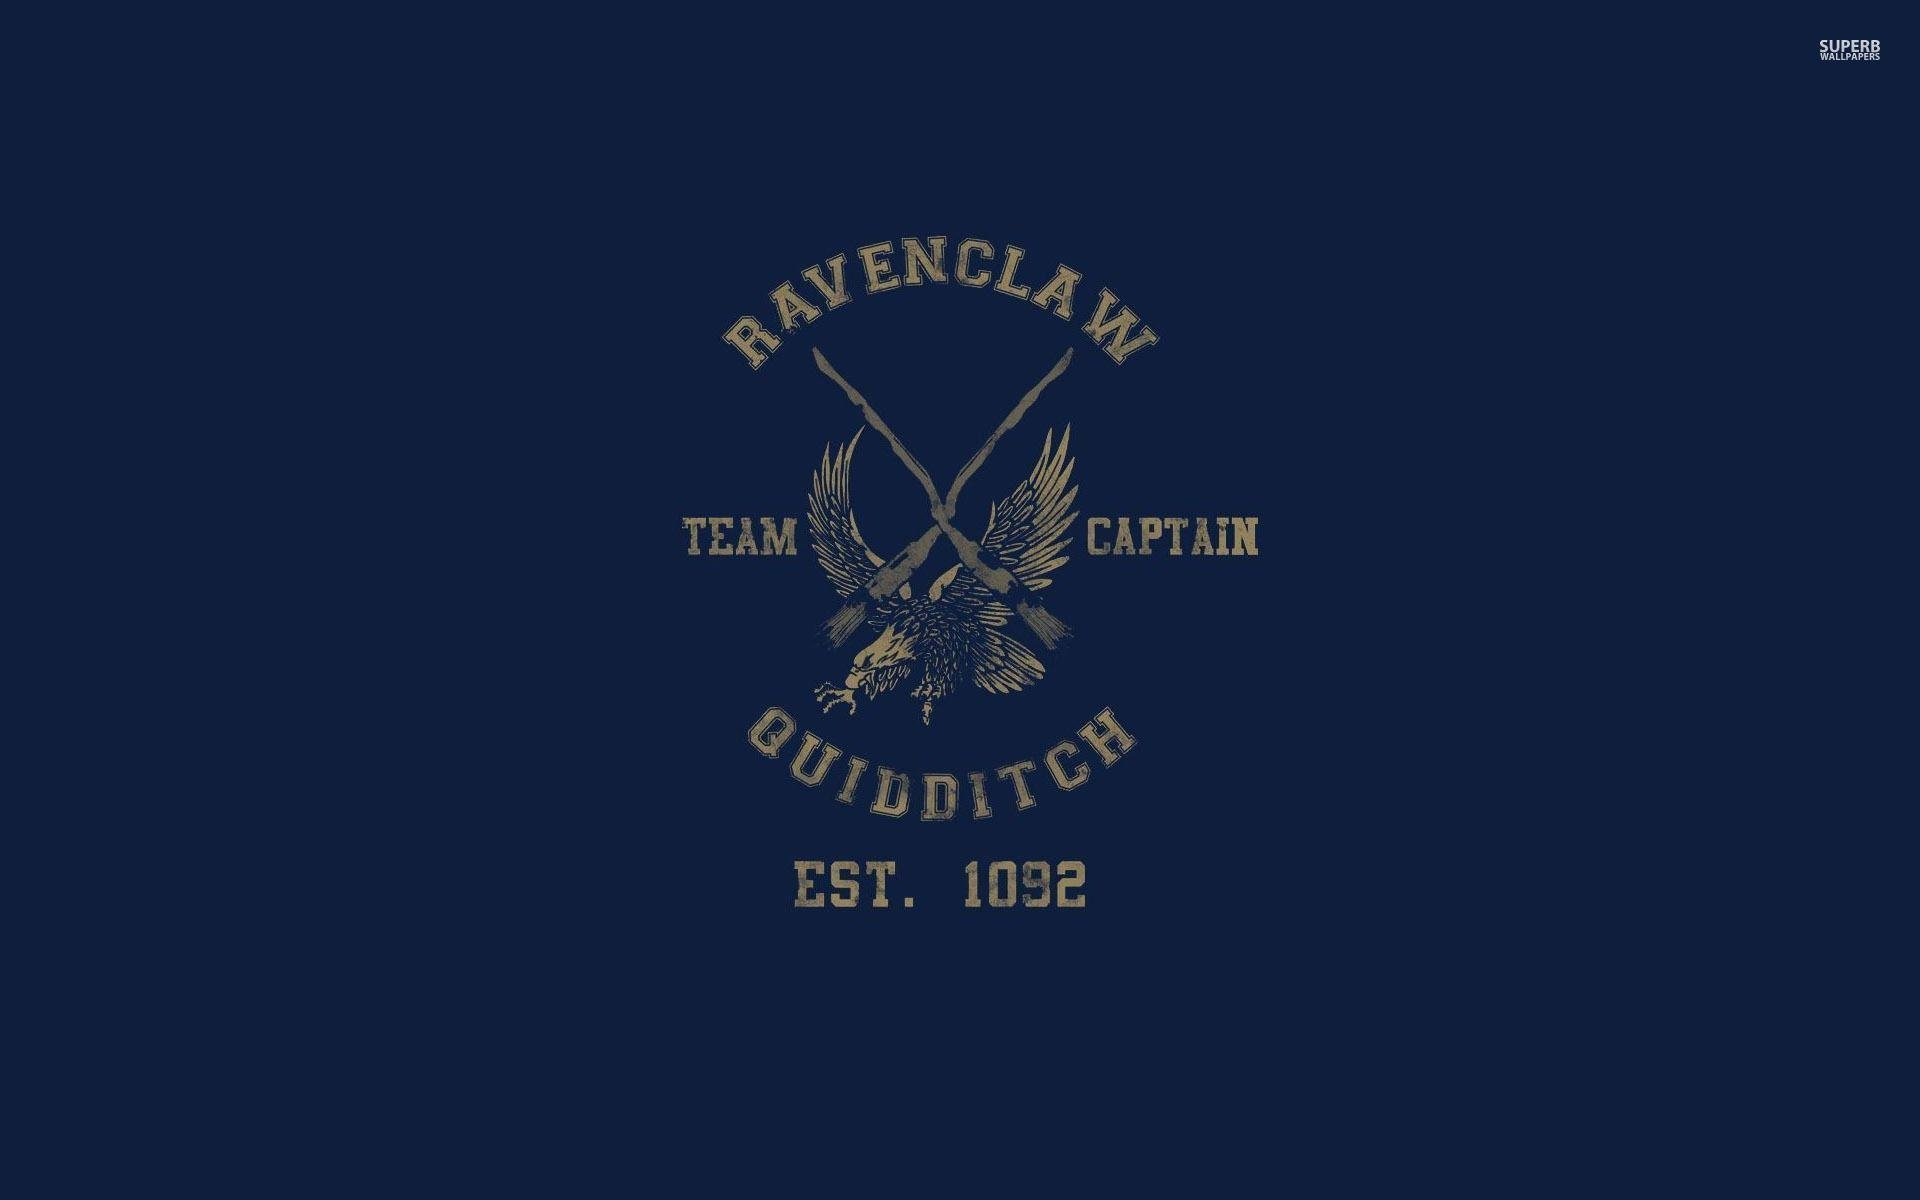 Ravenclaw Quidditch team - Harry Potter wallpaper - Vector .